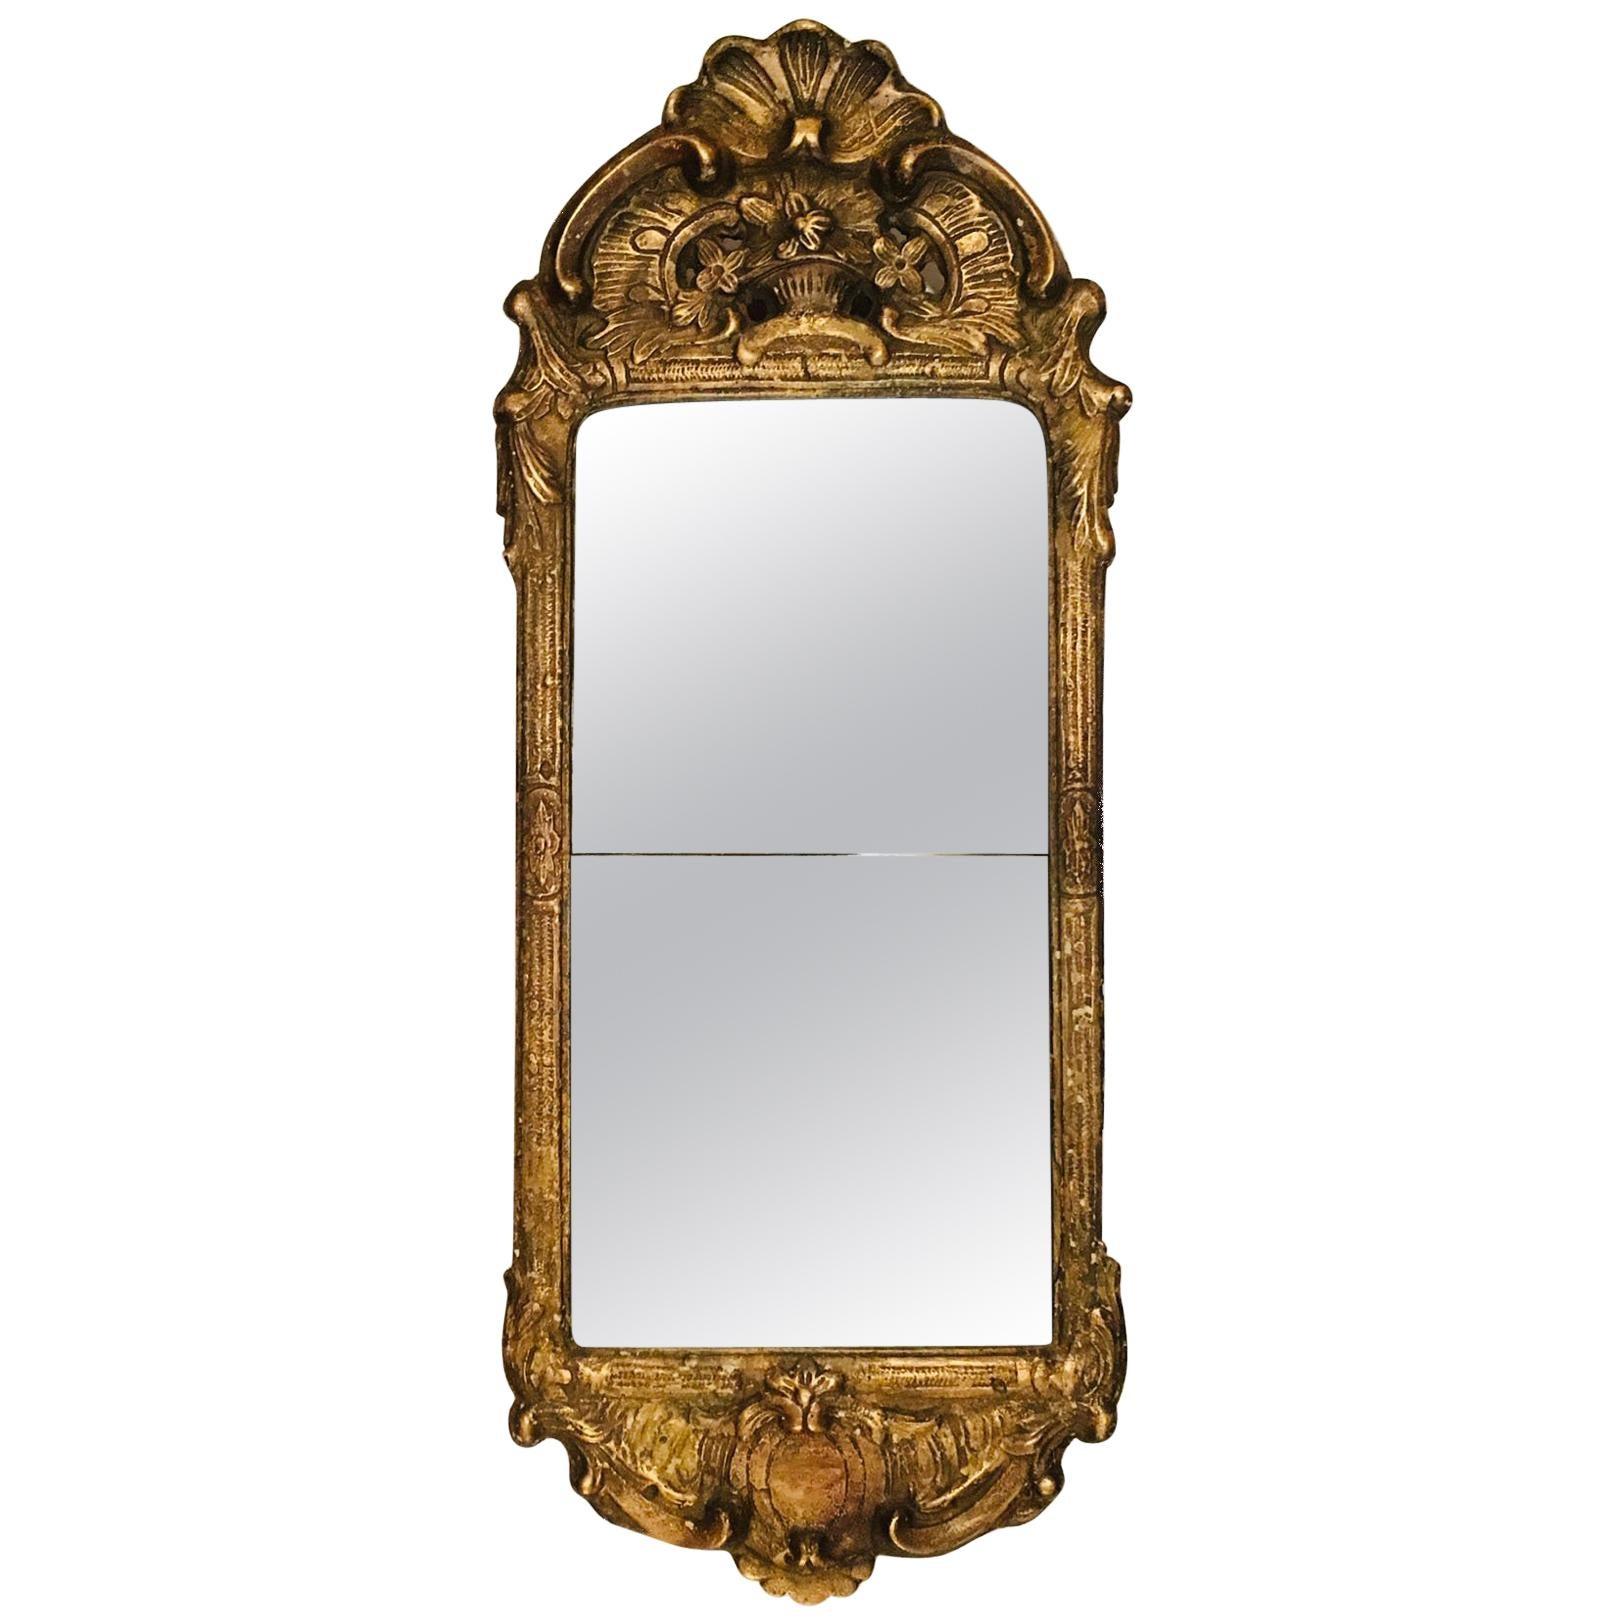 18th Century Antique Swedish Rococo Giltwood and Gesso Mirror, circa 1750